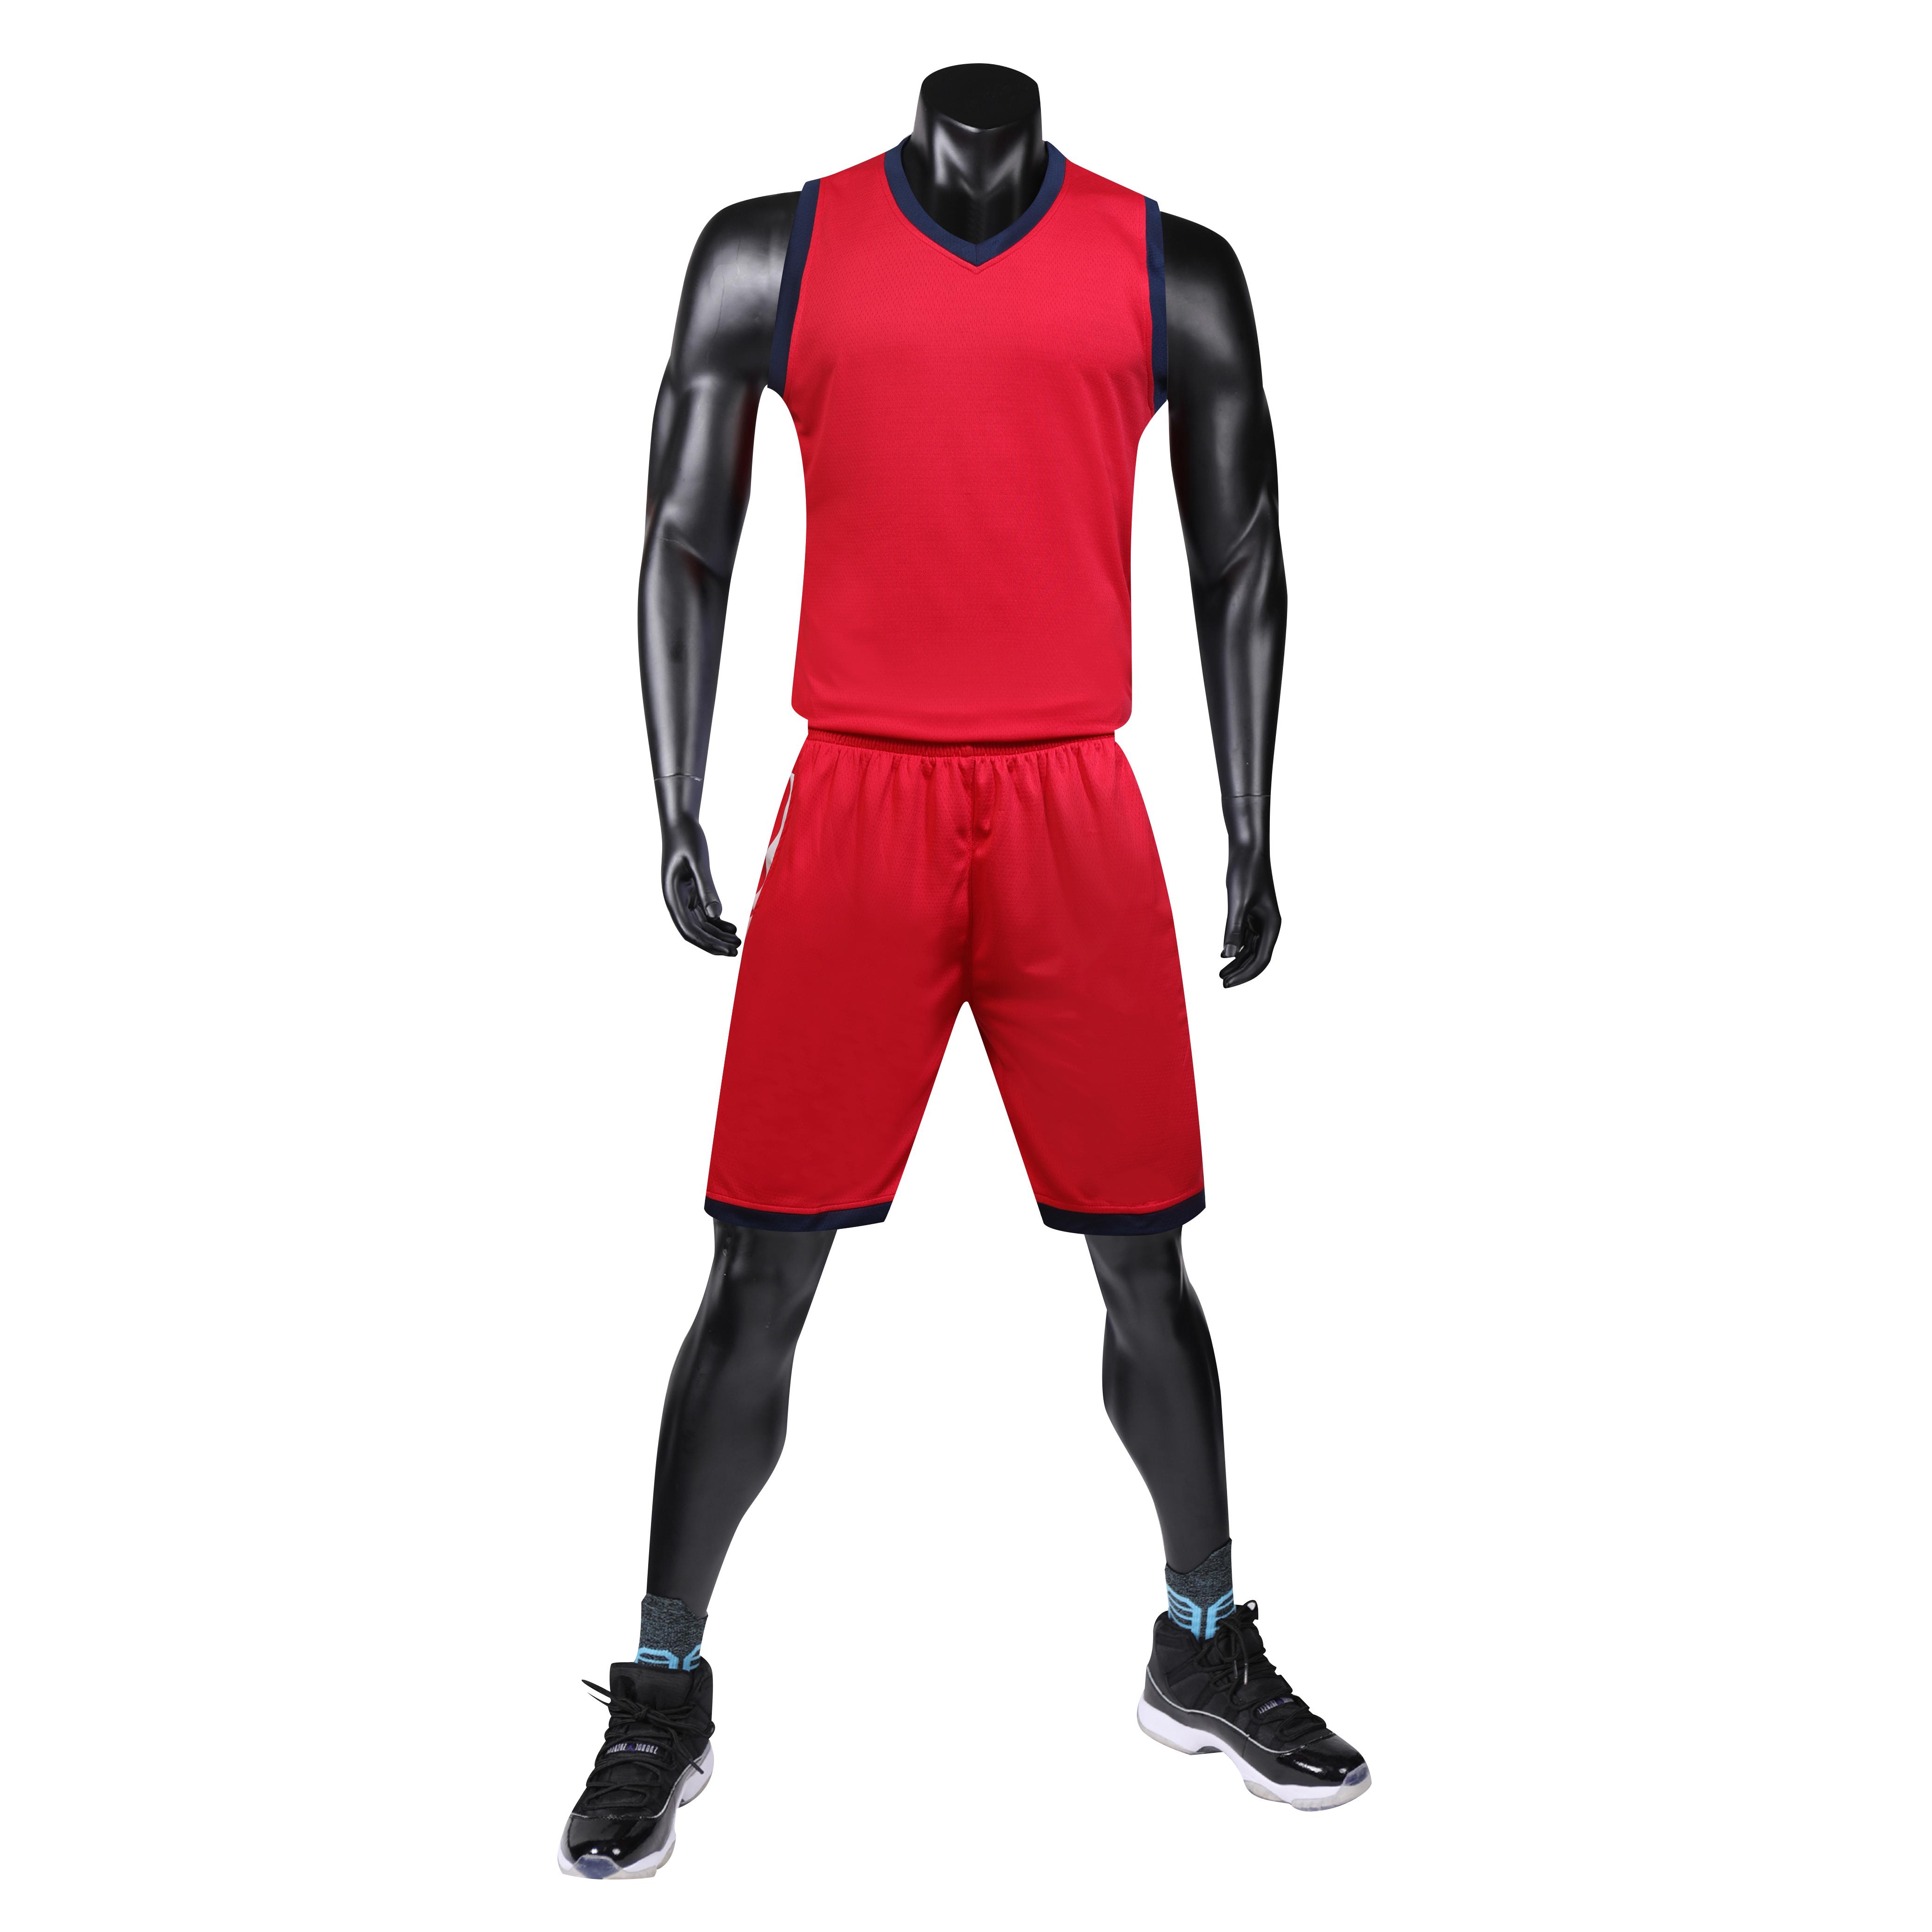 deni mens basketball - HD4152×4152